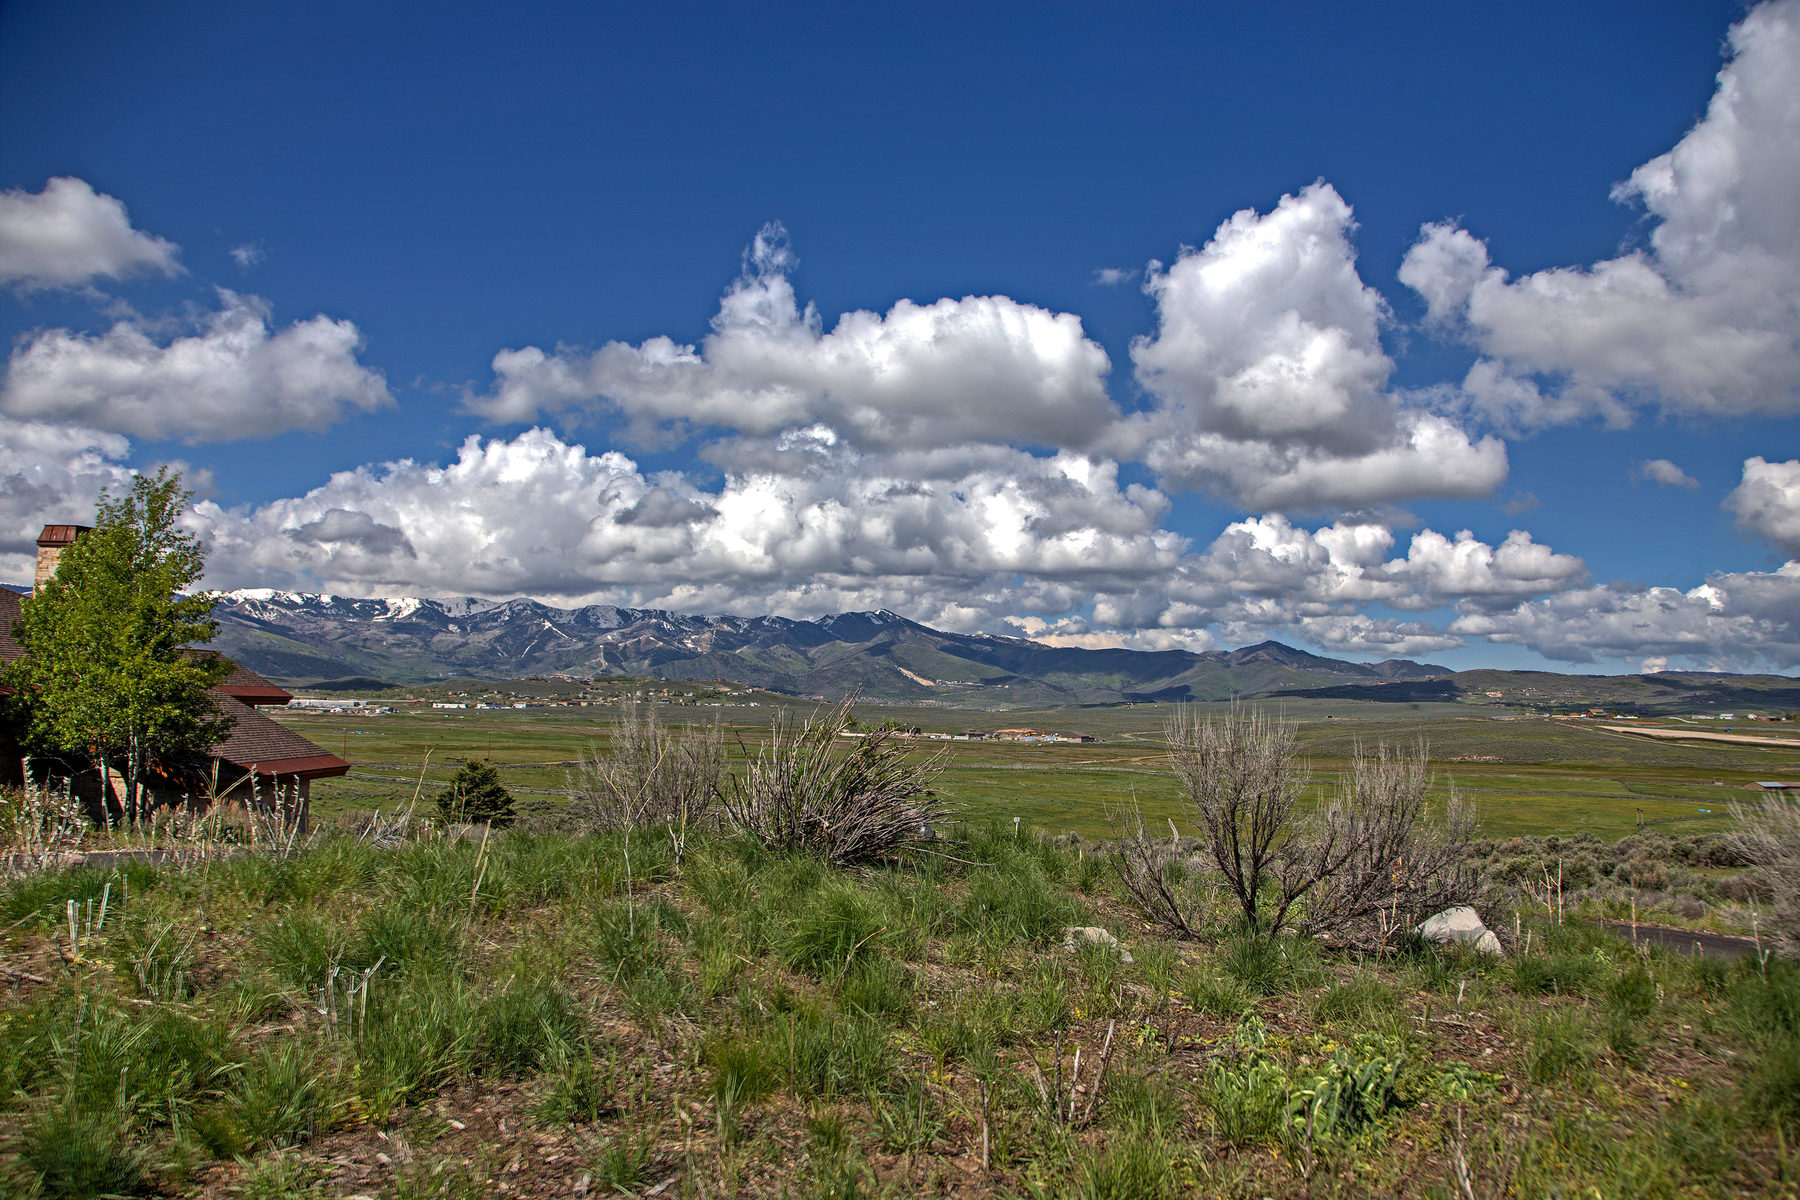 Terreno por un Venta en Fabulous View Lot With 115,000 Golf Membership Deposit Included 7341 N Westview Draw Lot 24 Park City, Utah, 84098 Estados Unidos